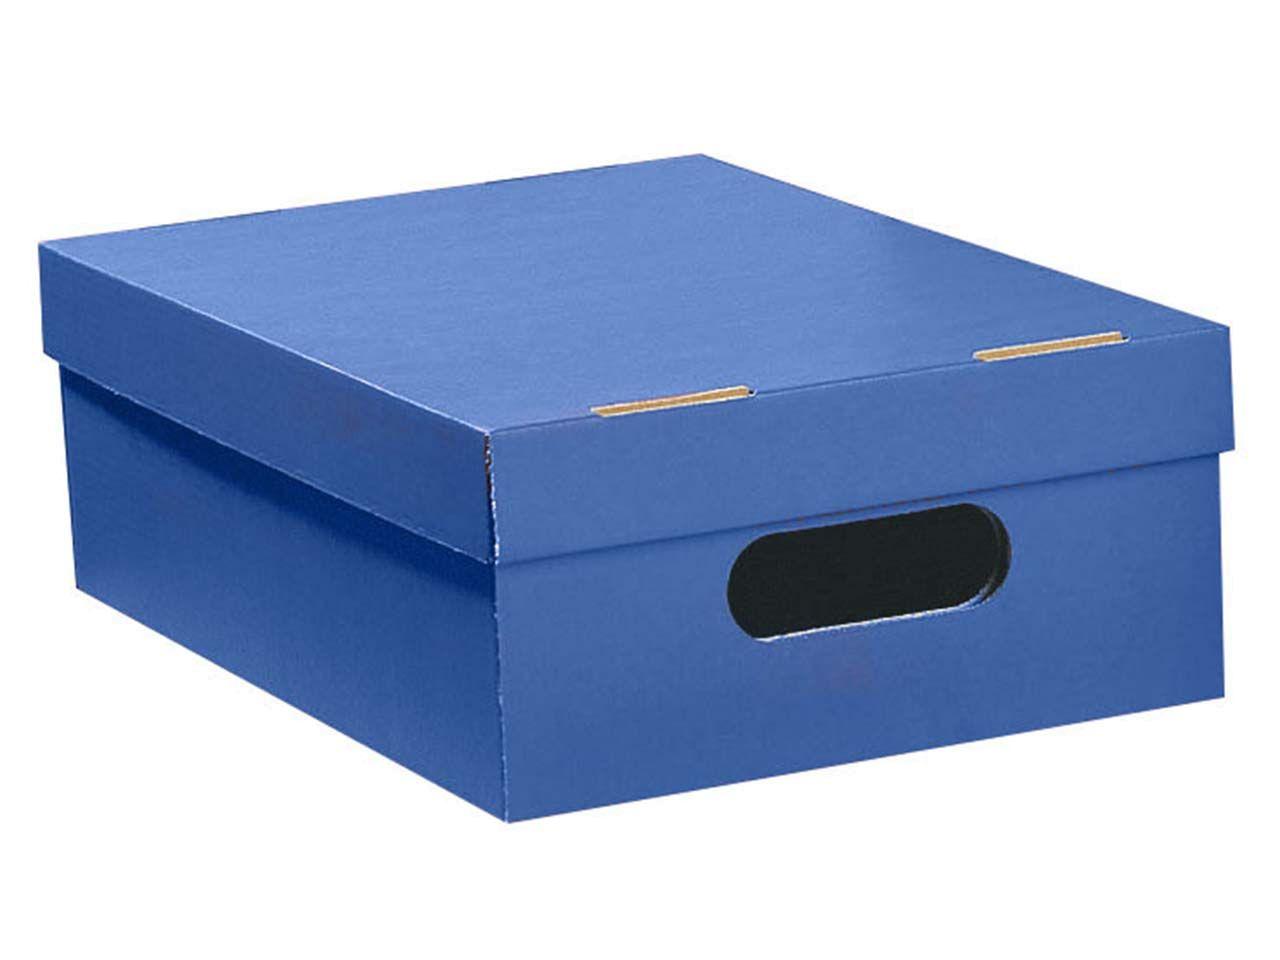 Stülpkiste blau klein 7049blau